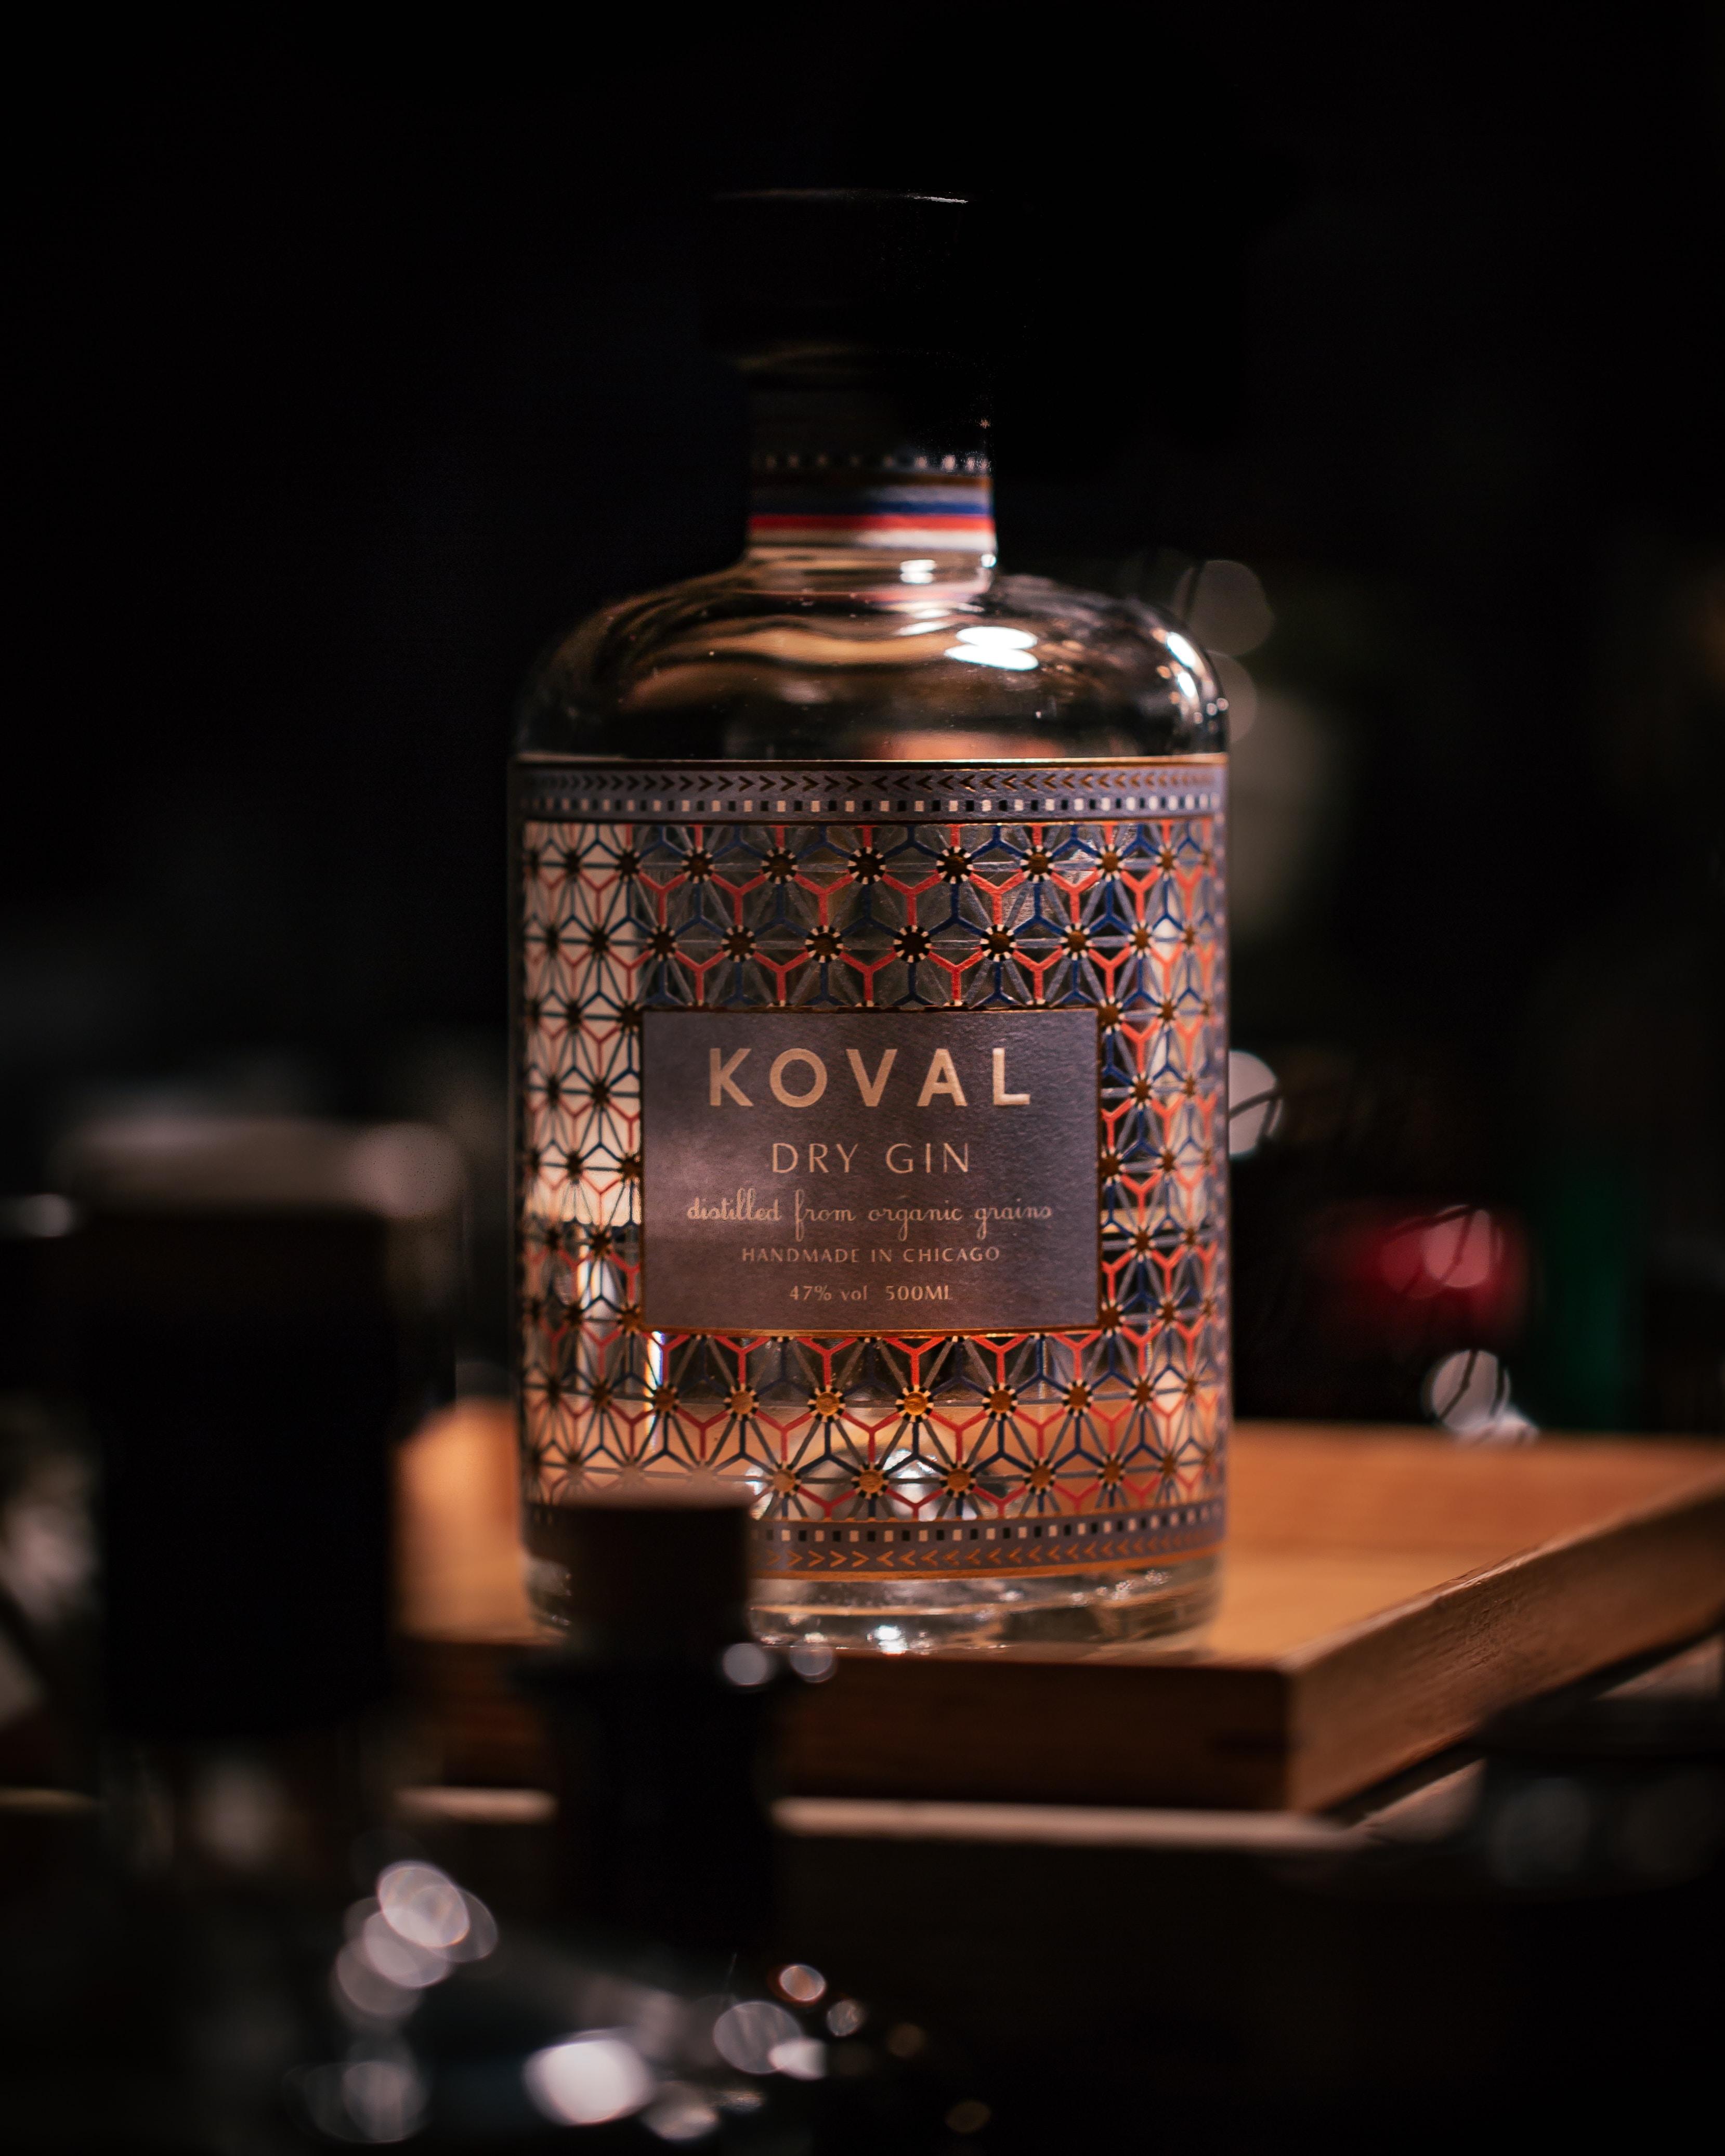 Koval dry gin bottle